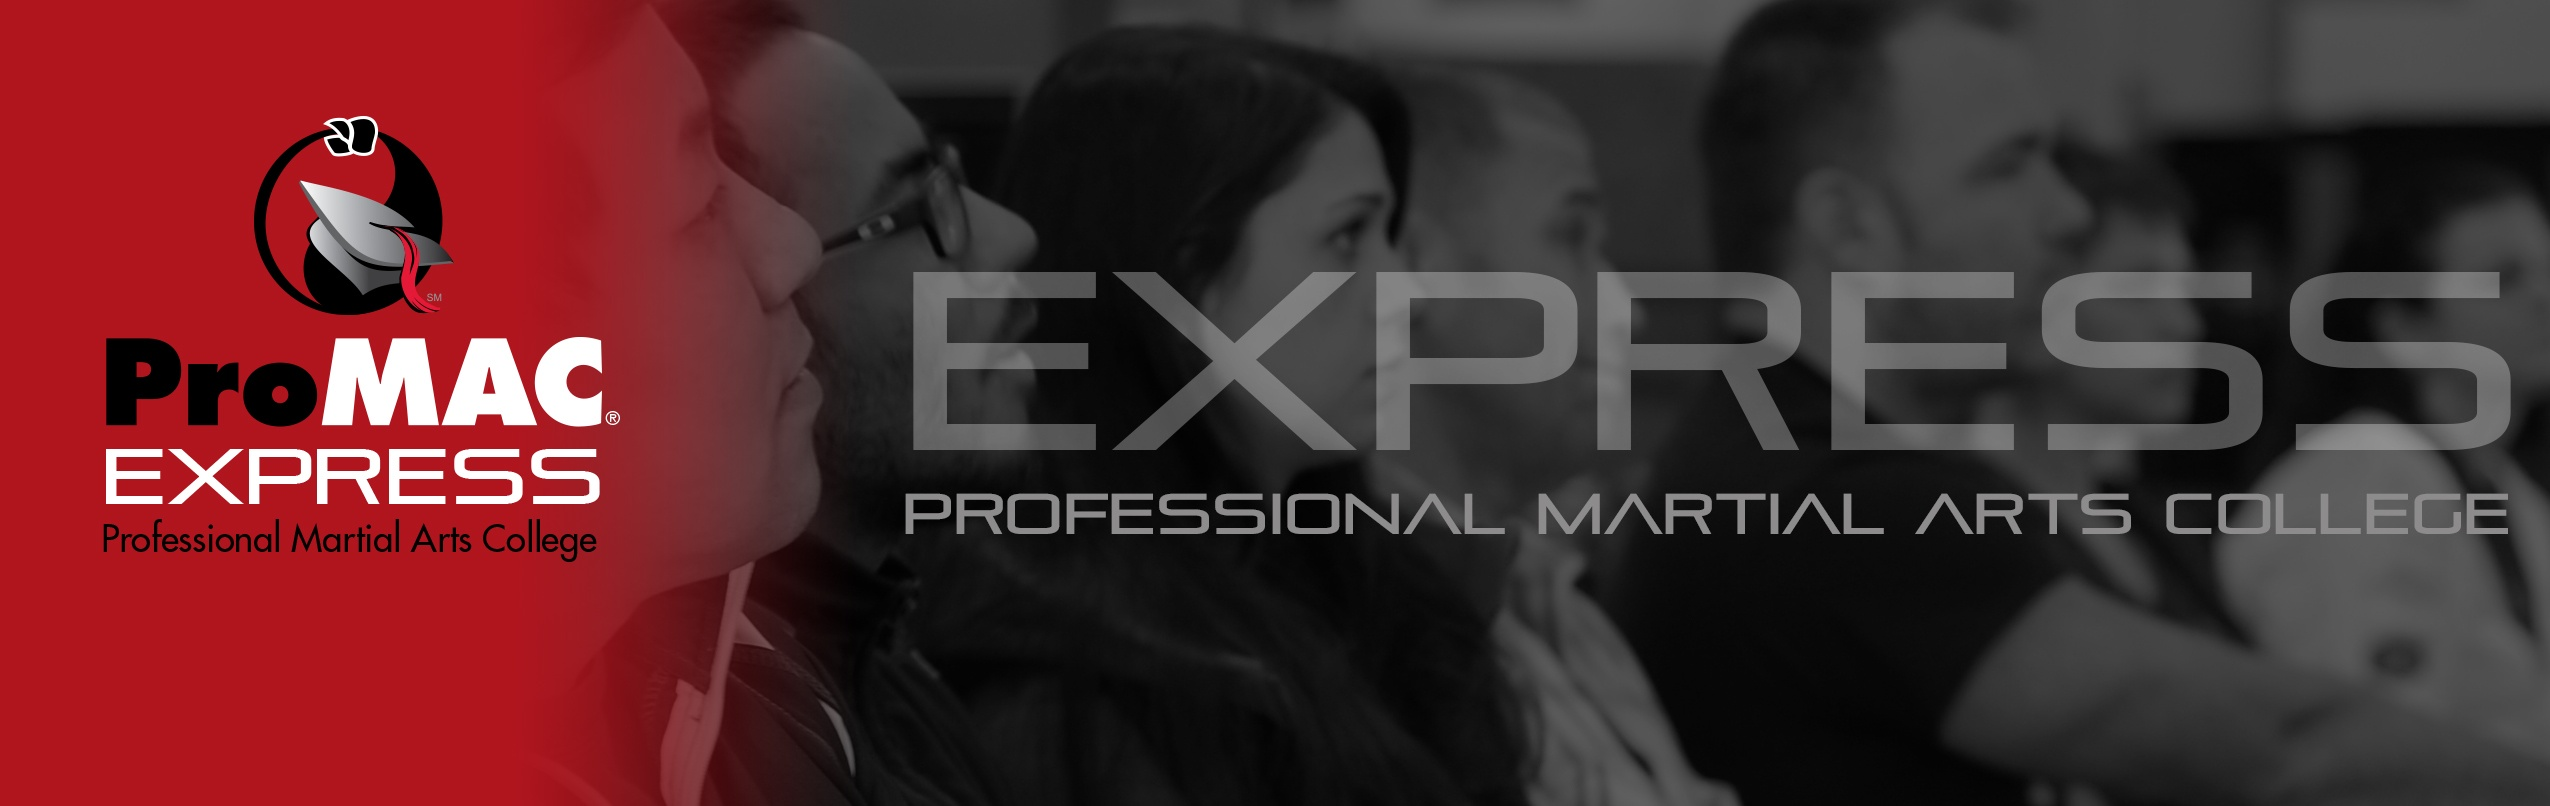 KS_Express_Cover_image.jpg